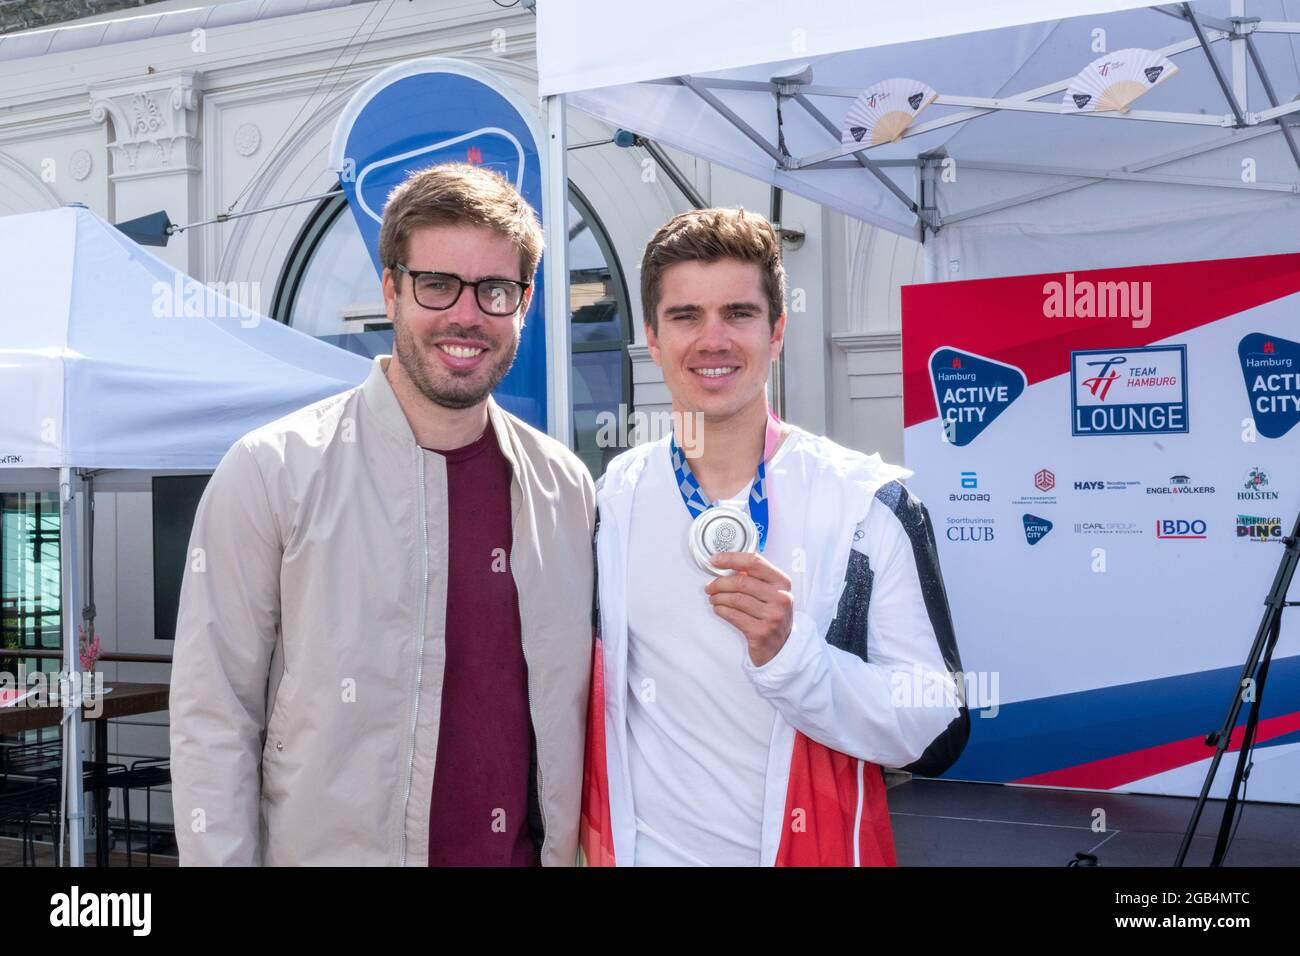 Bruder Eric, 2012 Olympiasieger im Deutschland-Achter, Torben Johannesen, Team Deutschland-Achter Rudern, Silbermedaille, Handeslkammer Hamburg, Acolp Banque D'Images